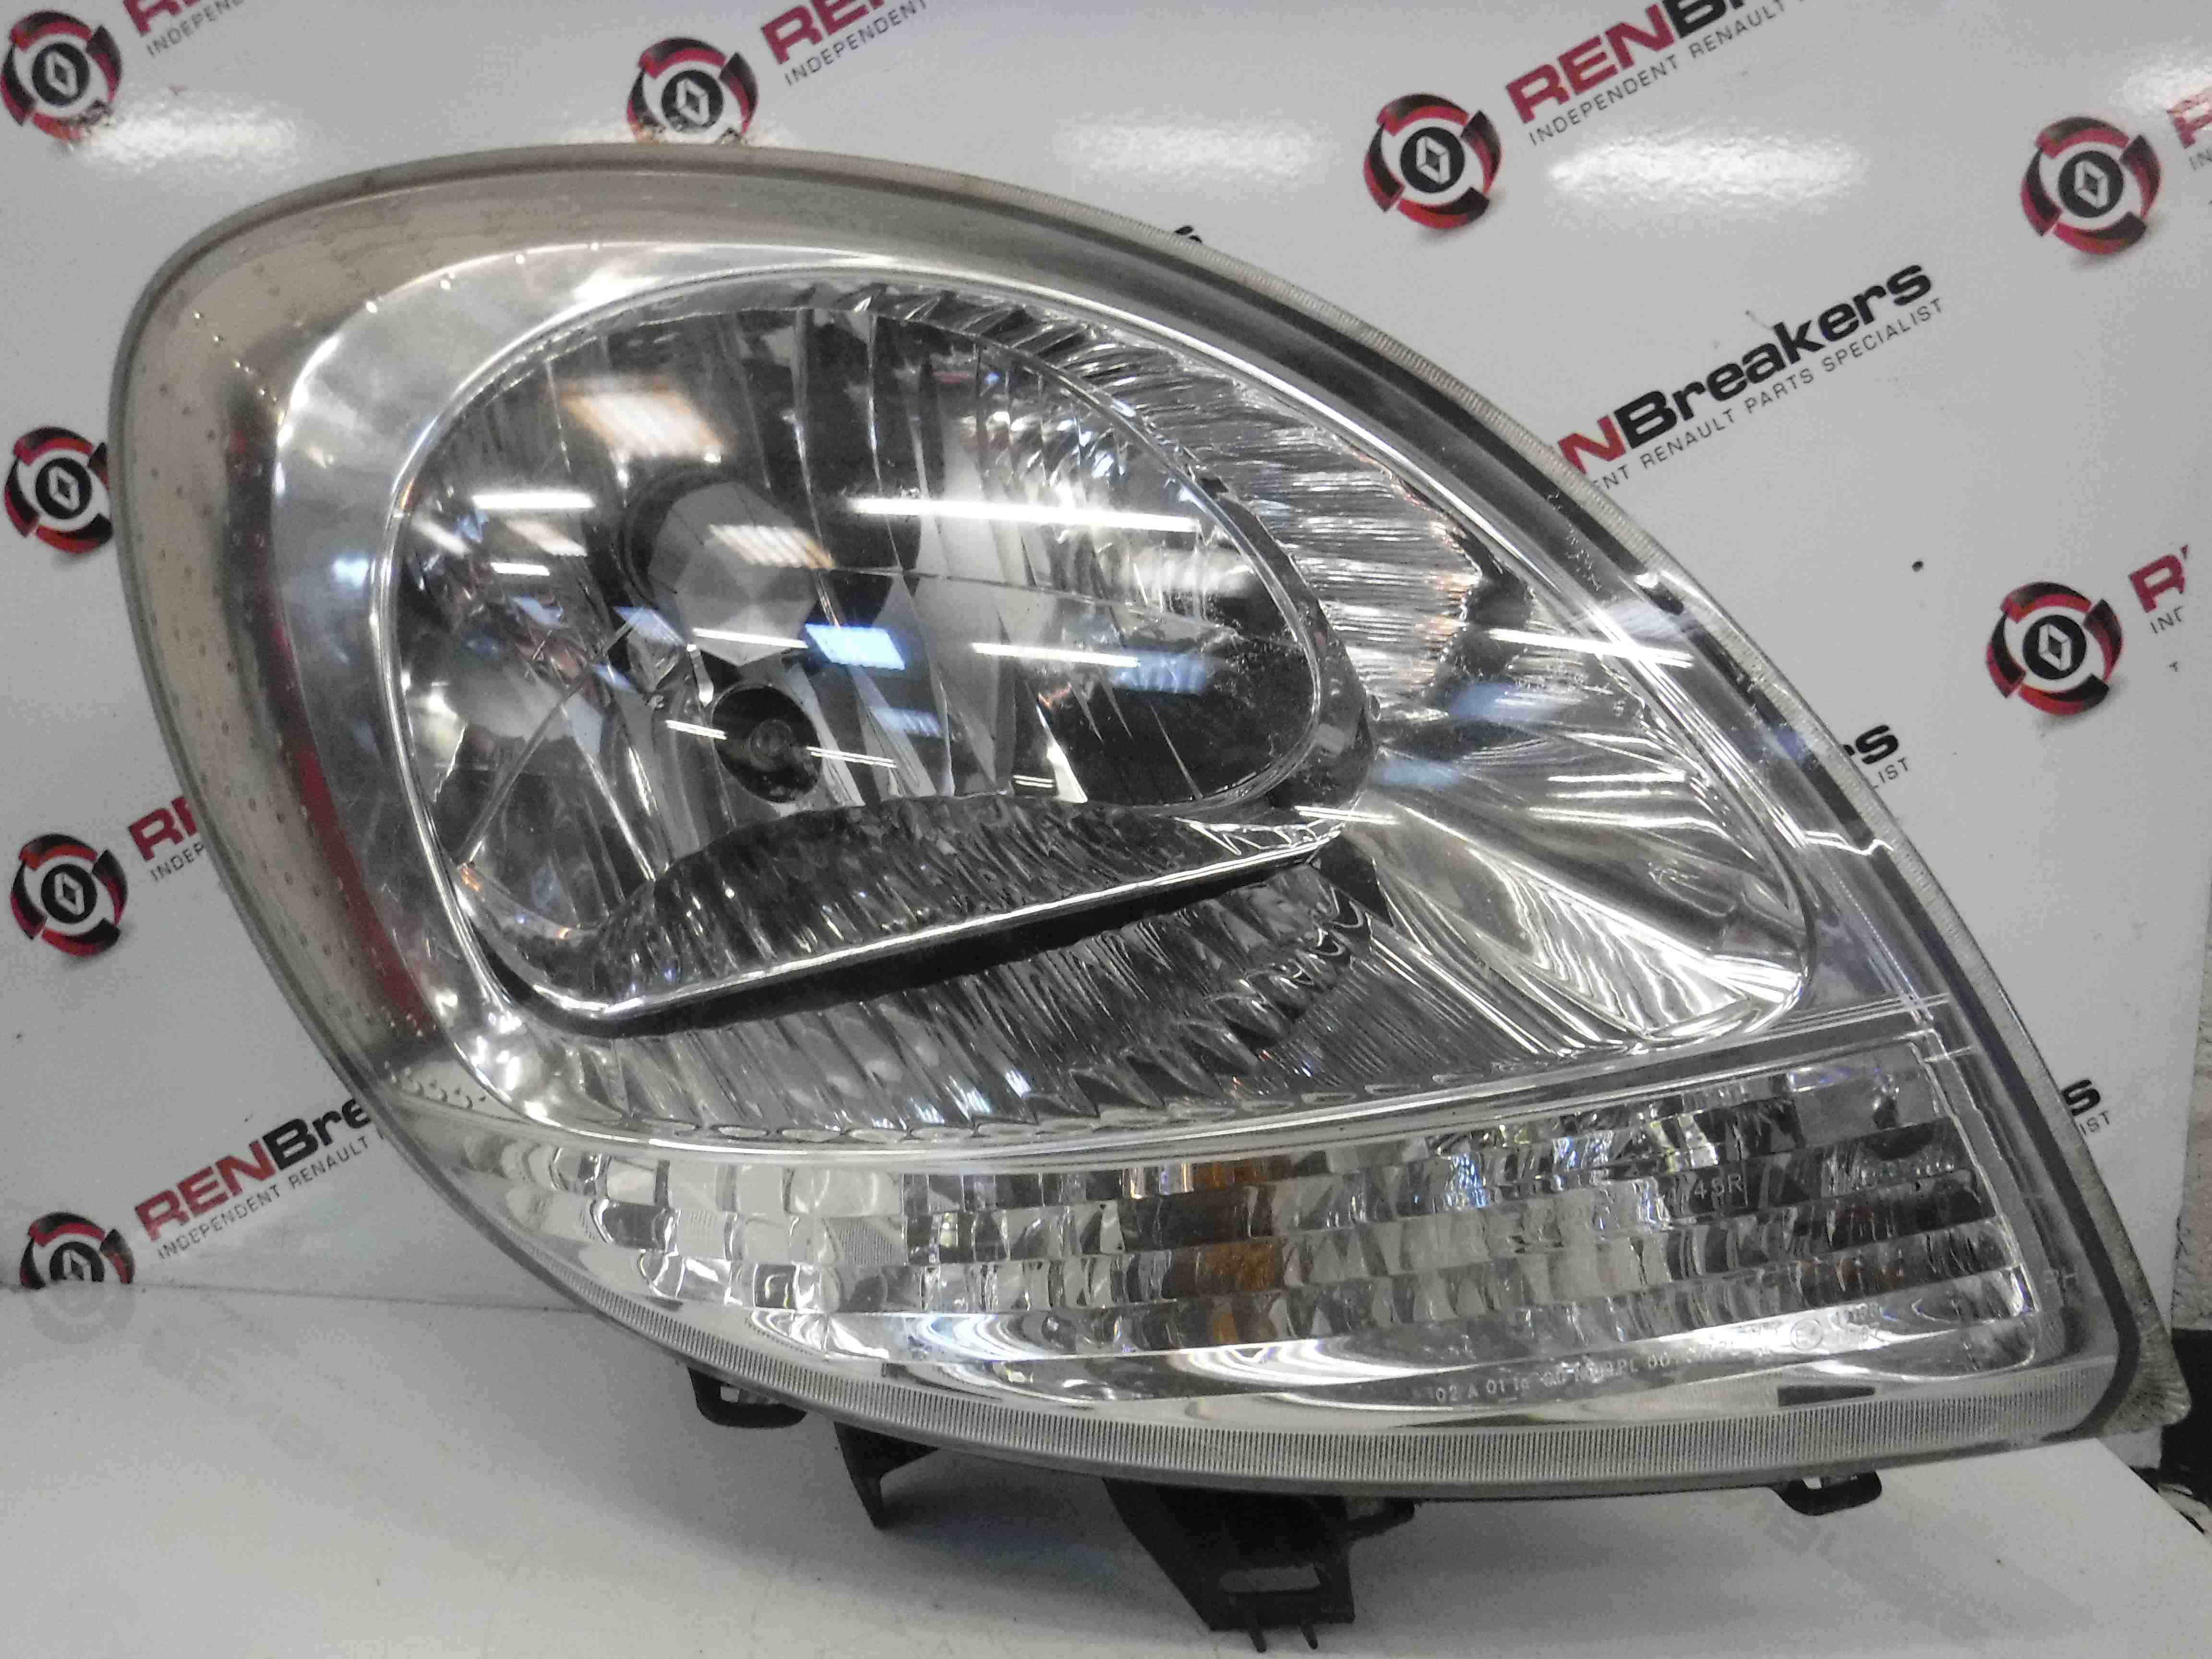 Renault Kangoo 2003-2007 Drivers OSF Front Headlight Clear Indicator 8200589035